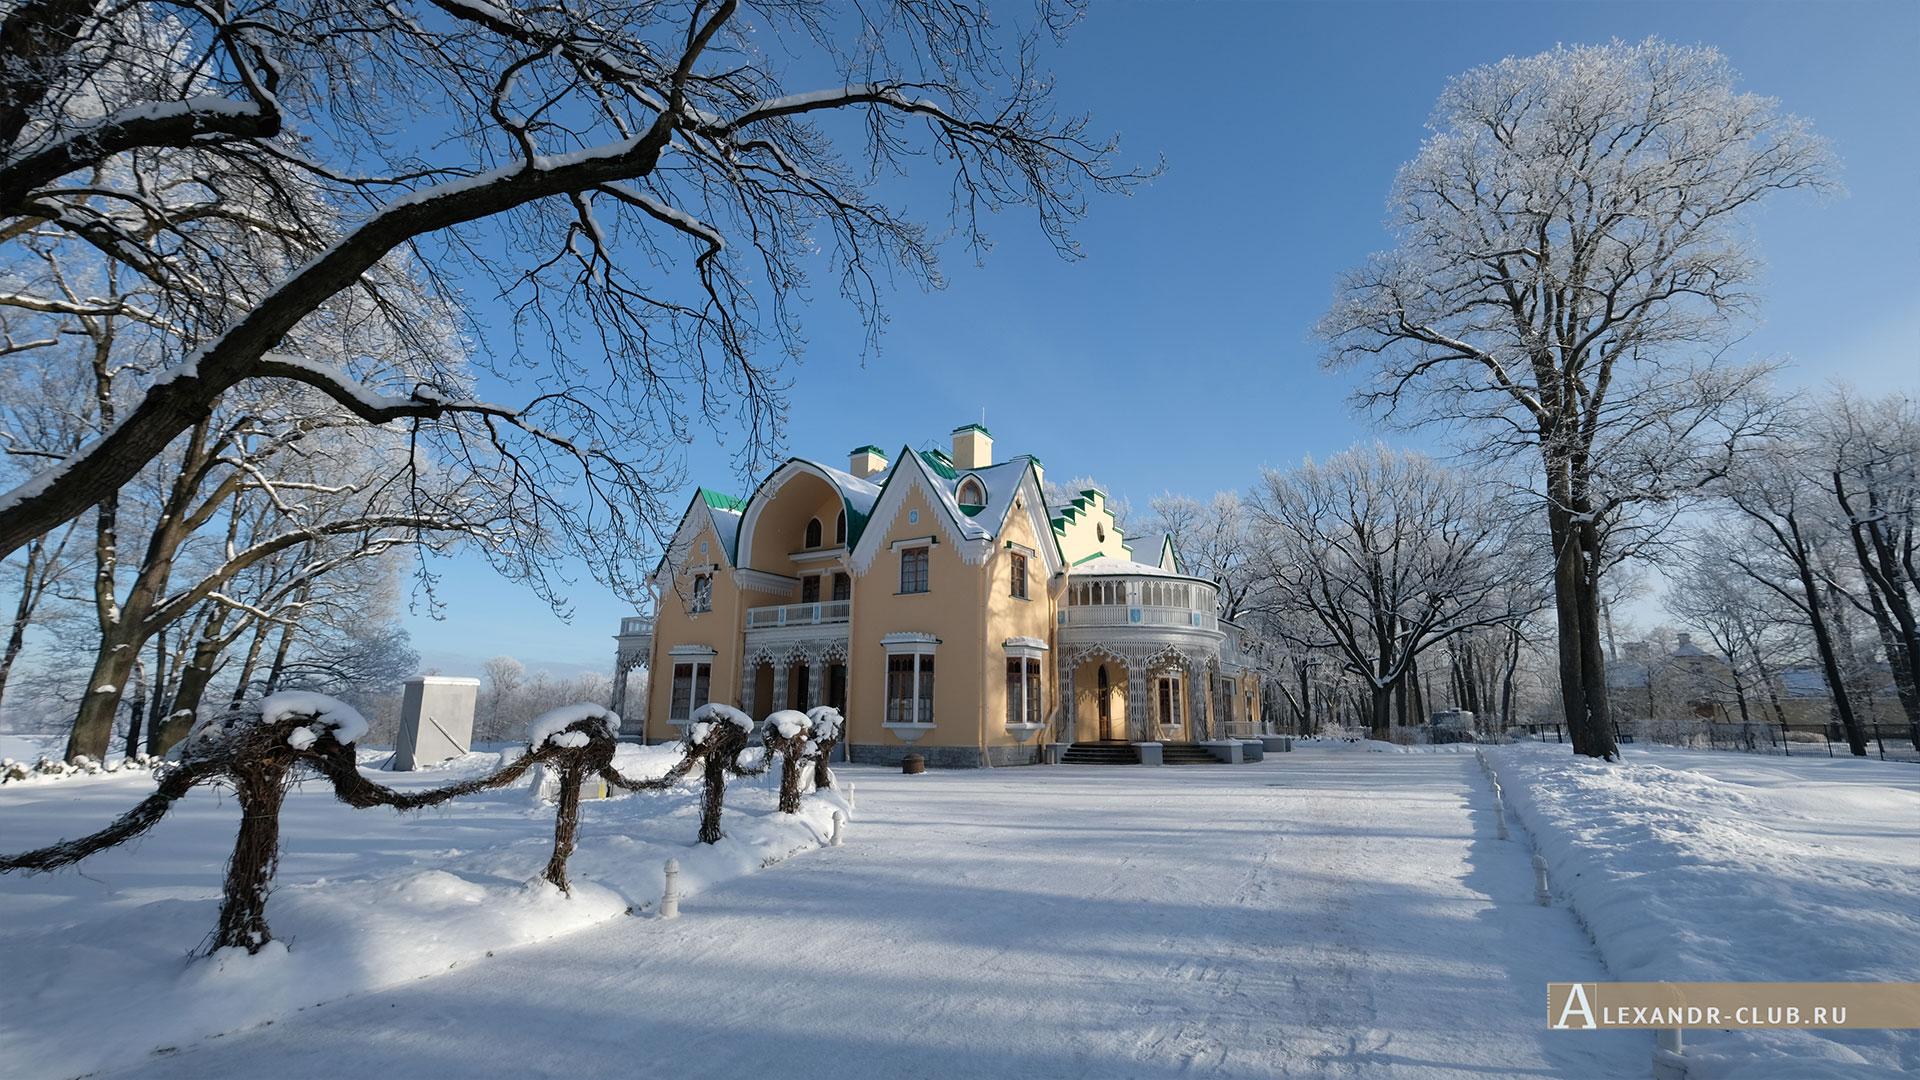 Петергоф, зима, парк «Александрия», дворец Коттедж